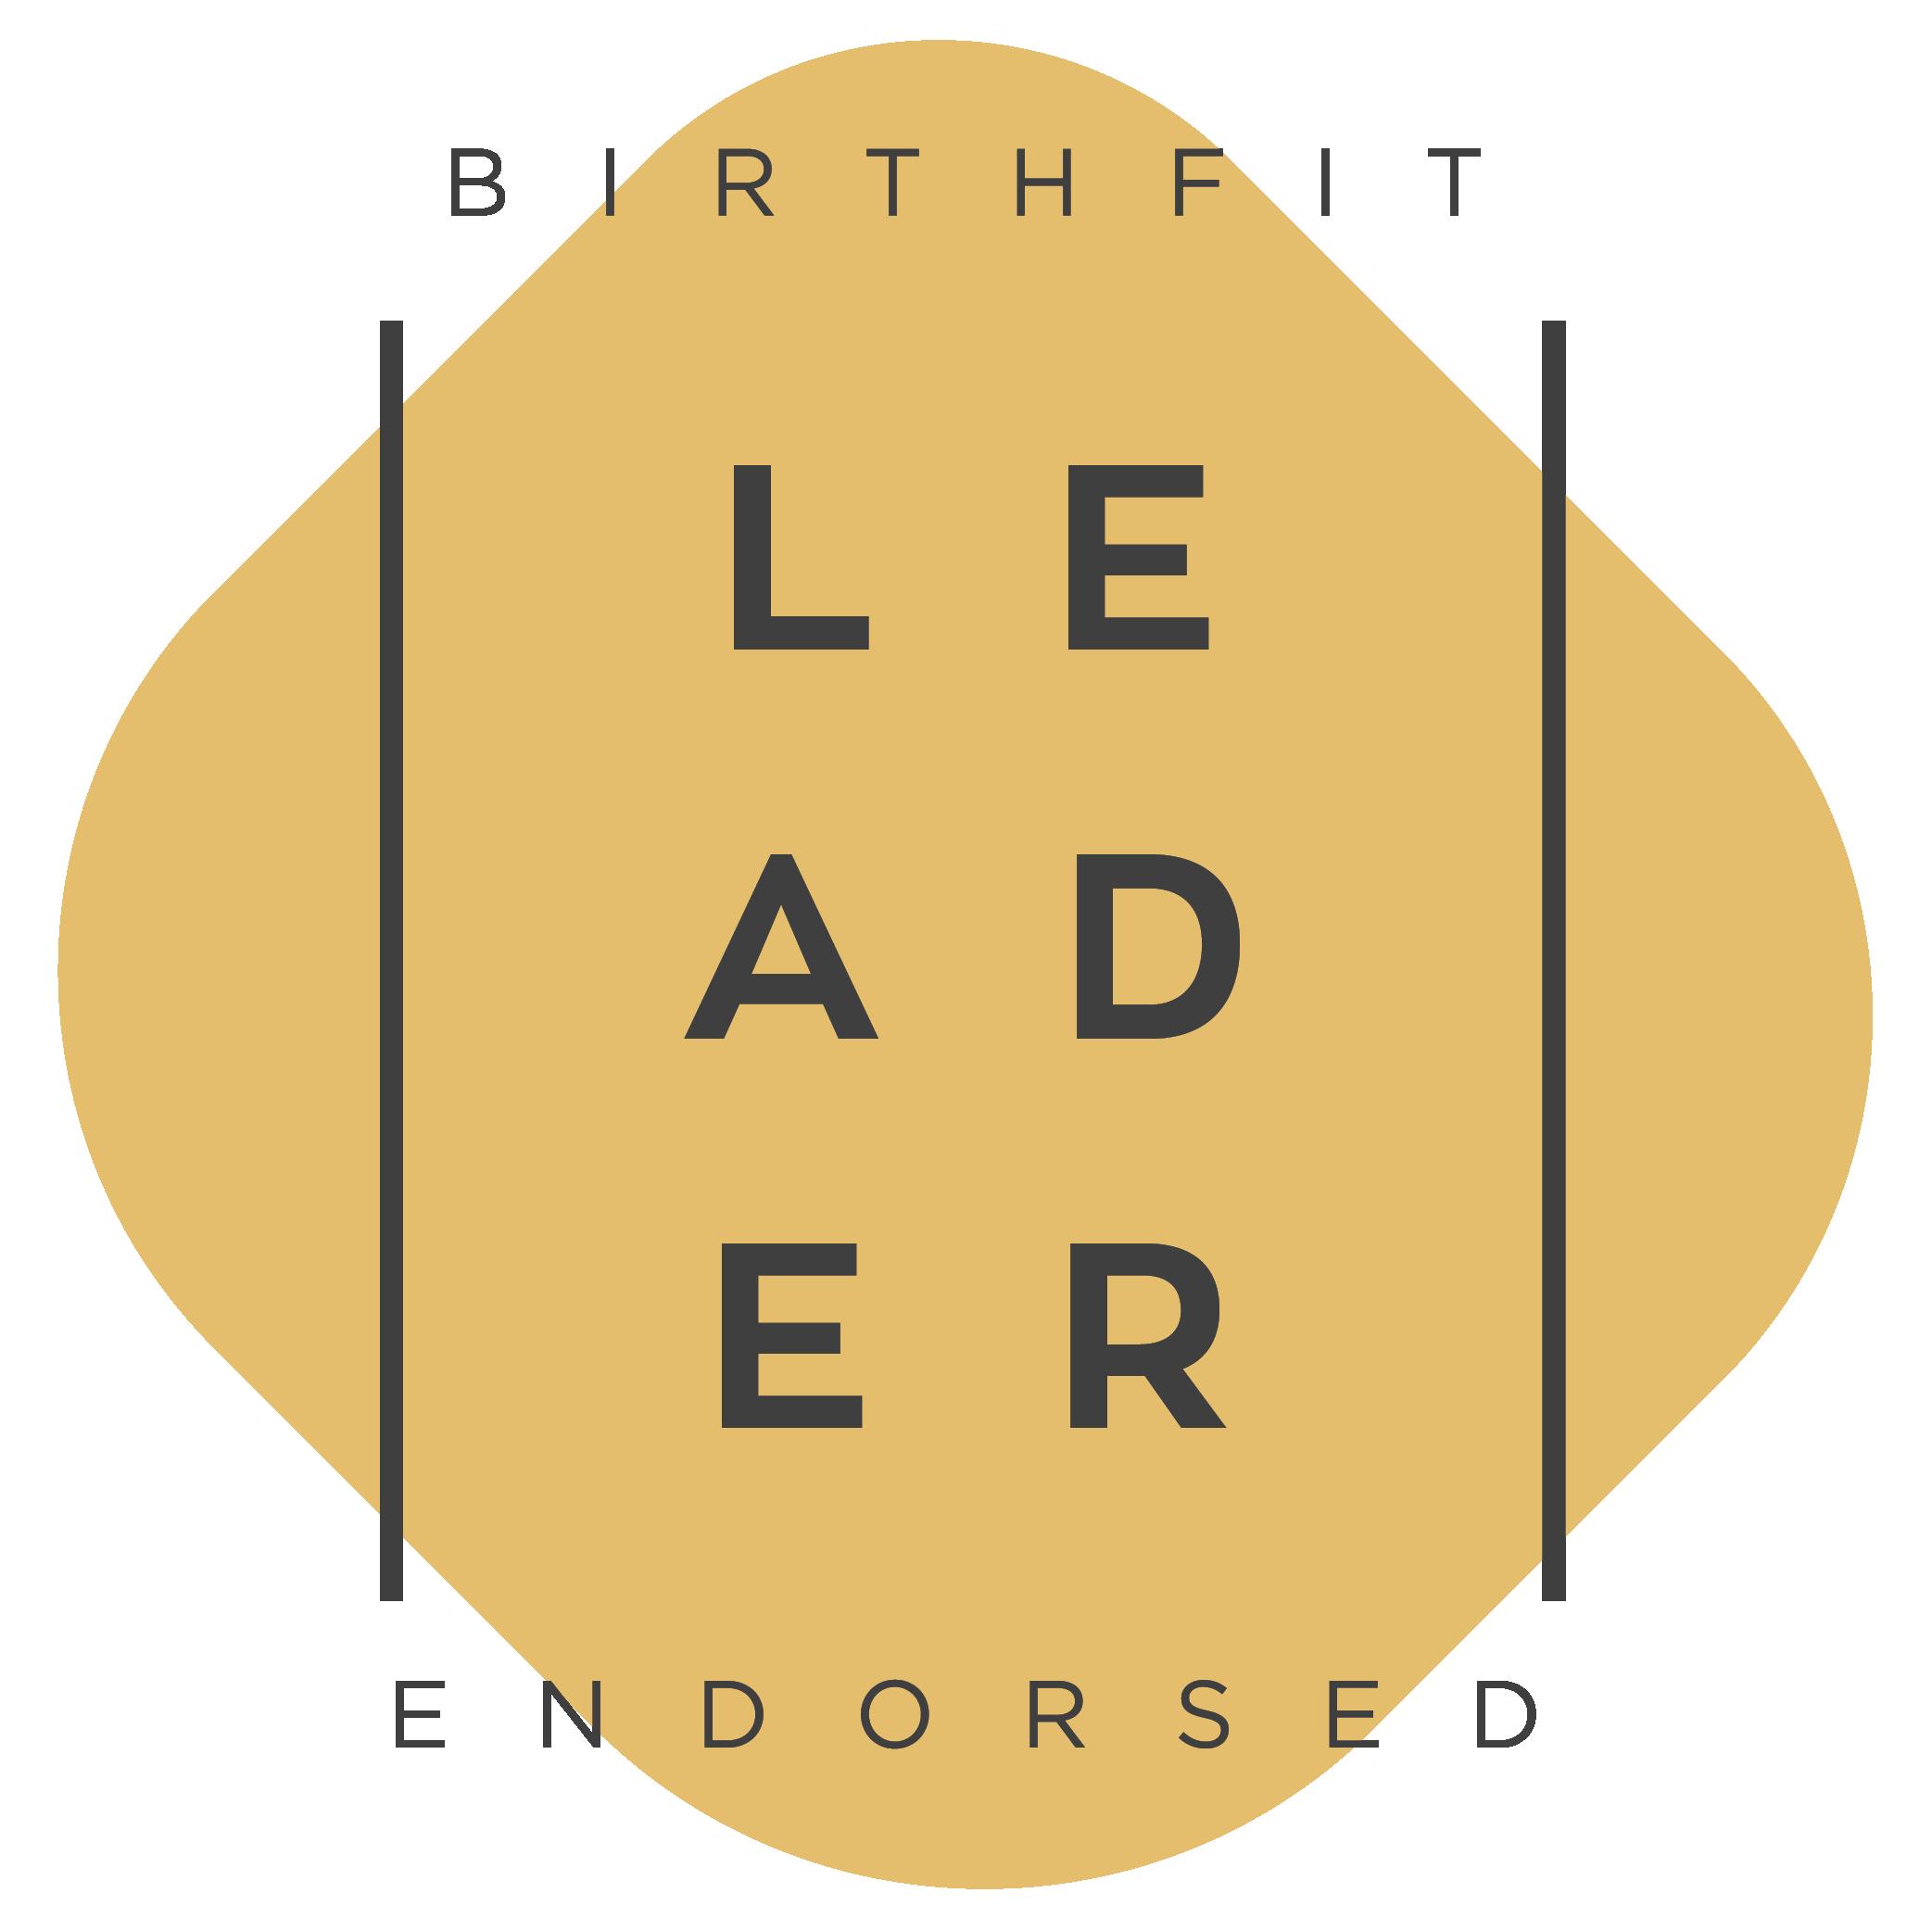 Birthfit leader badge